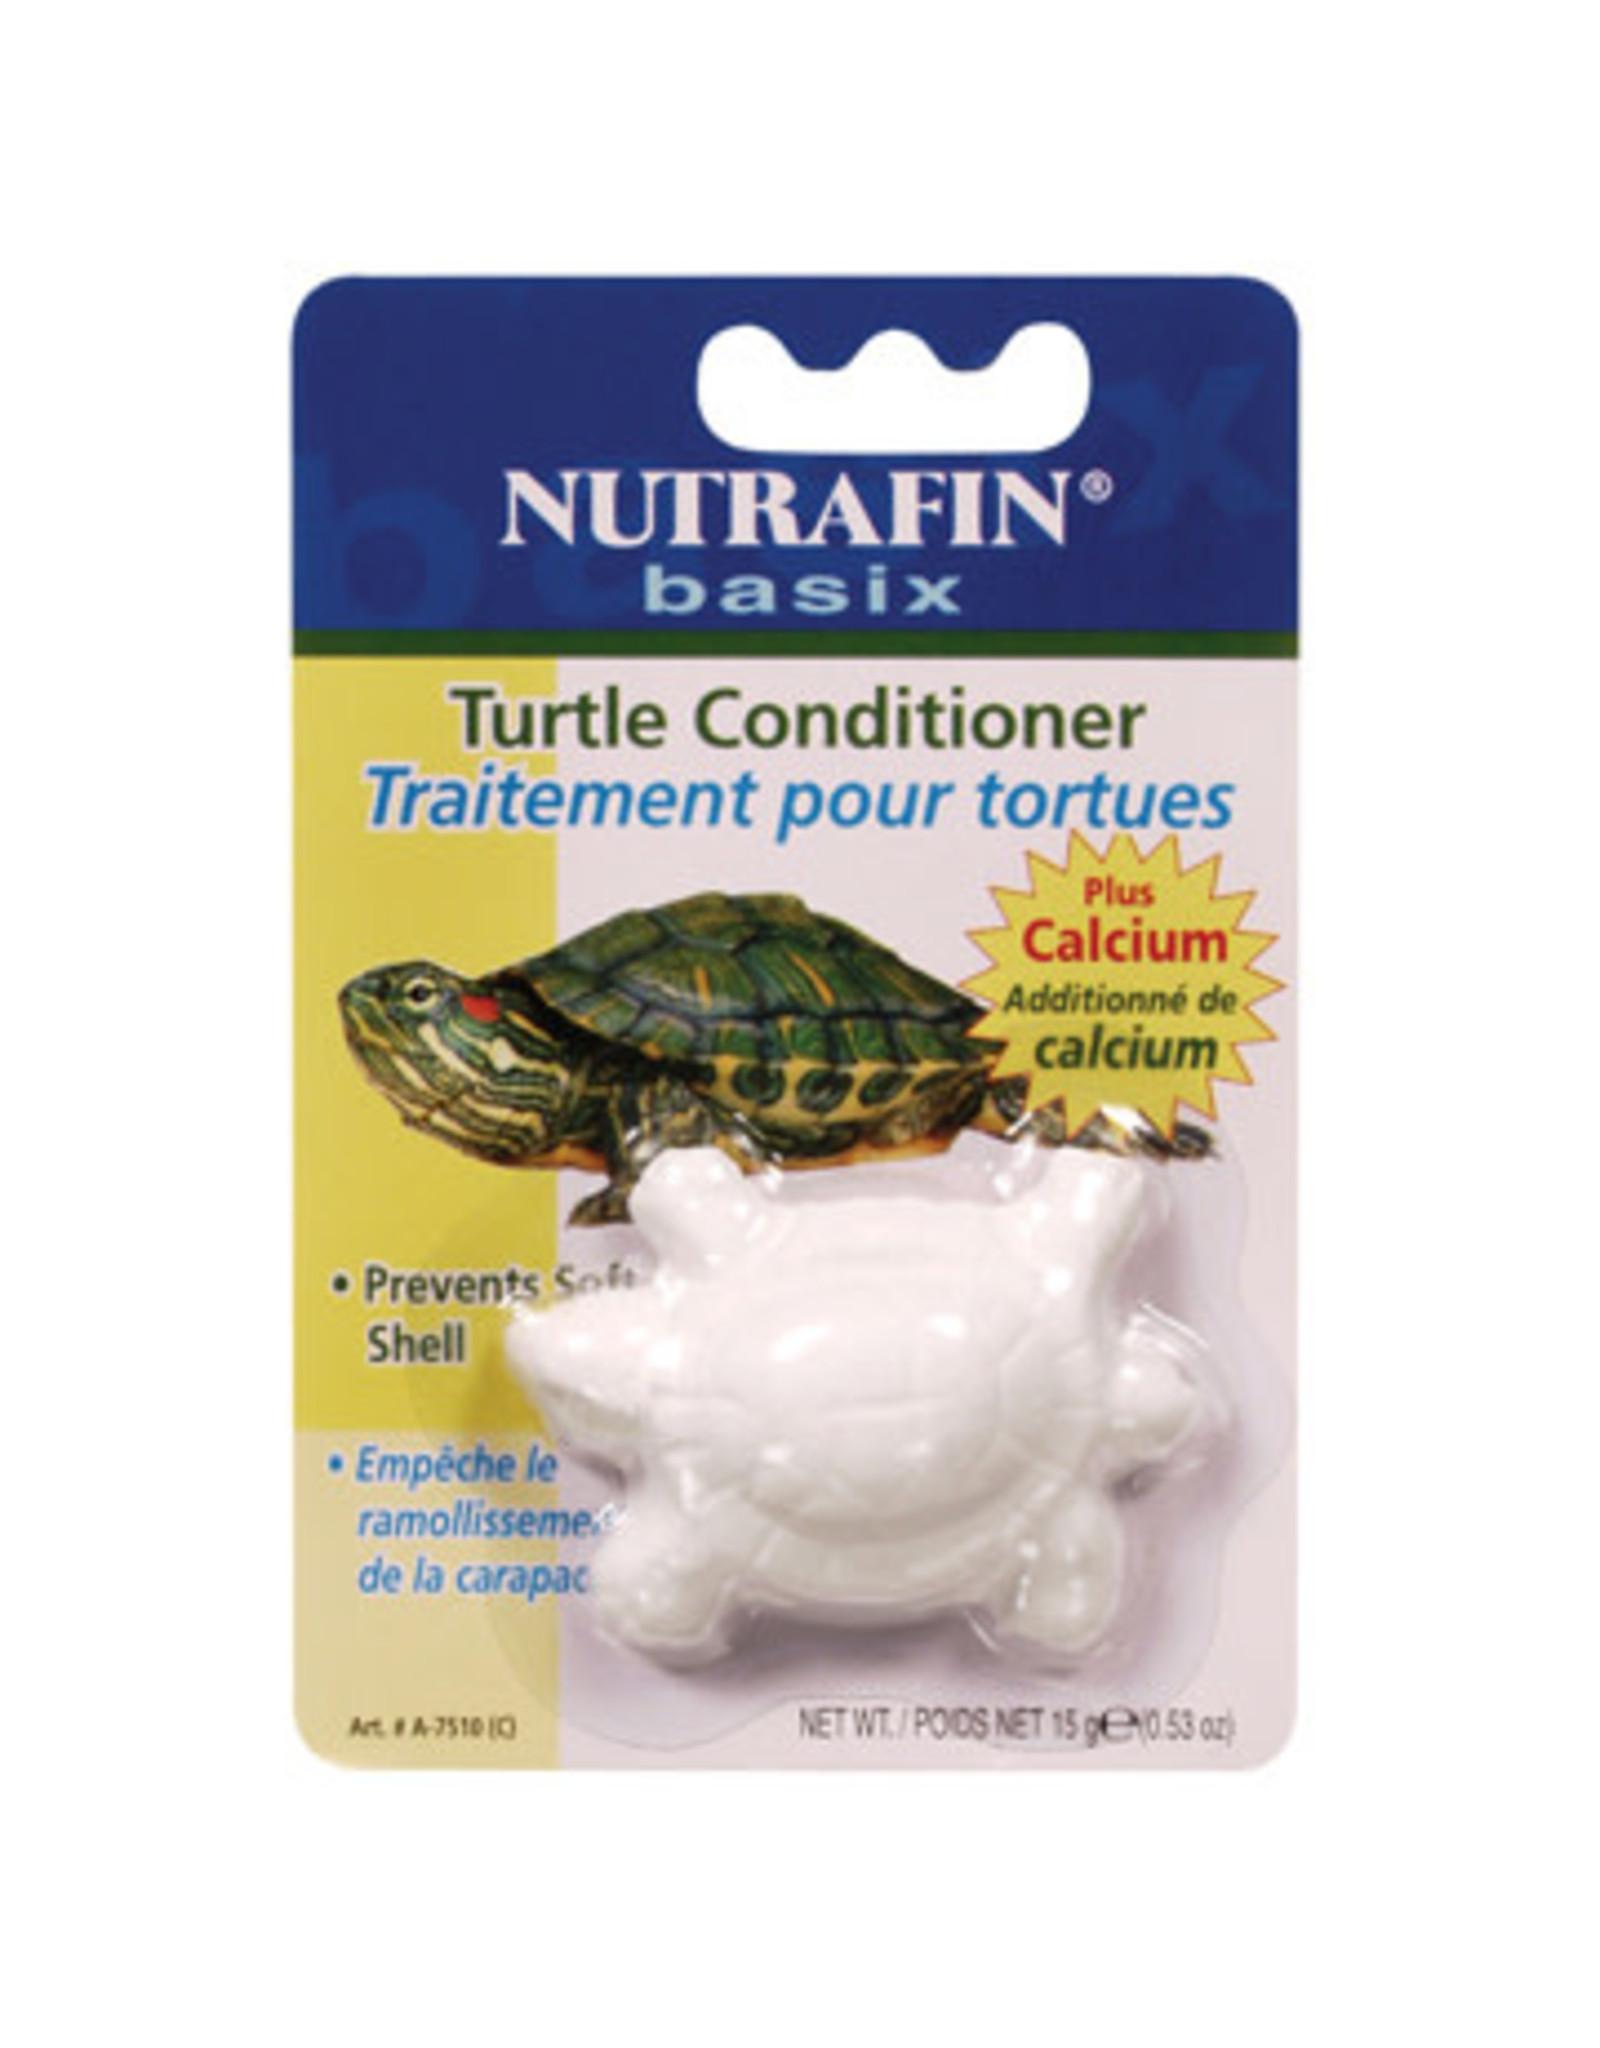 Nutrafin Nutrafin Basix Turtle Conditioner, 15g 0.5oz